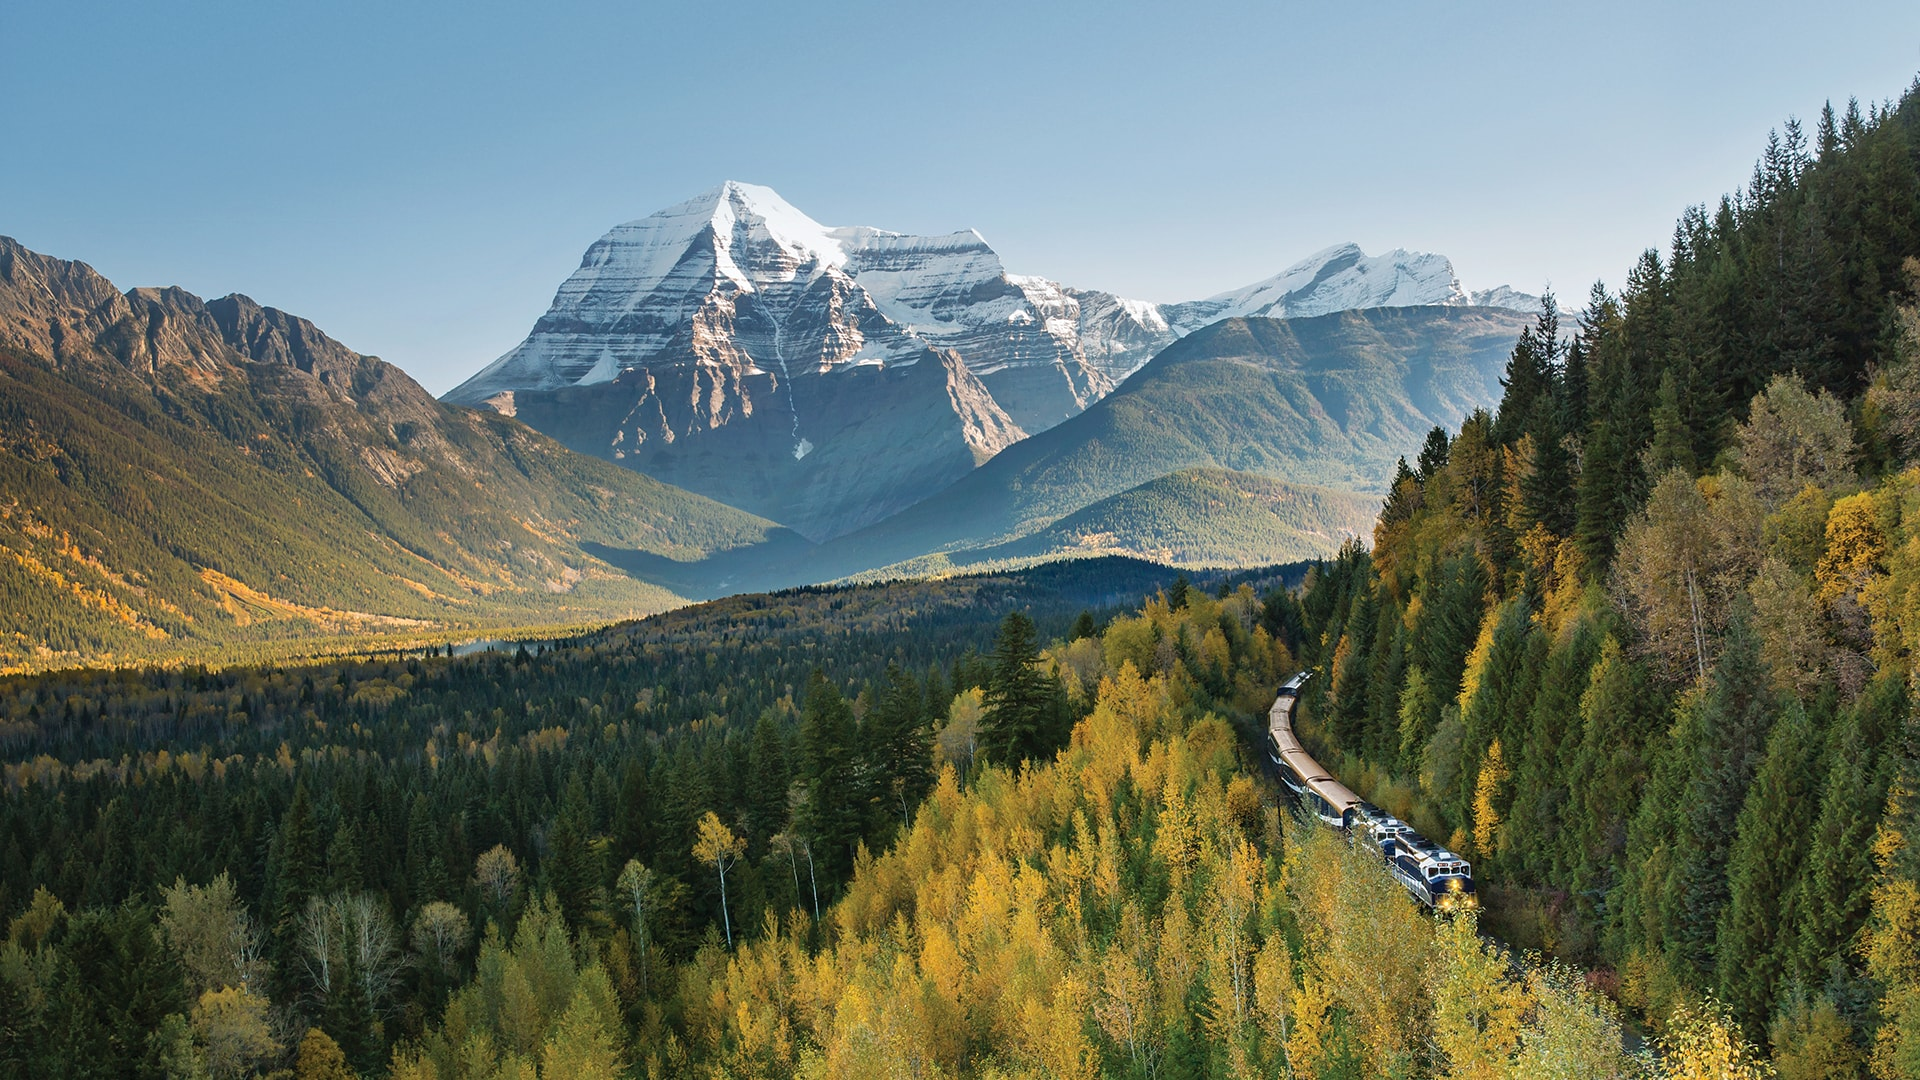 Canadian Rockies Luxury Train Trip For Fall 2019